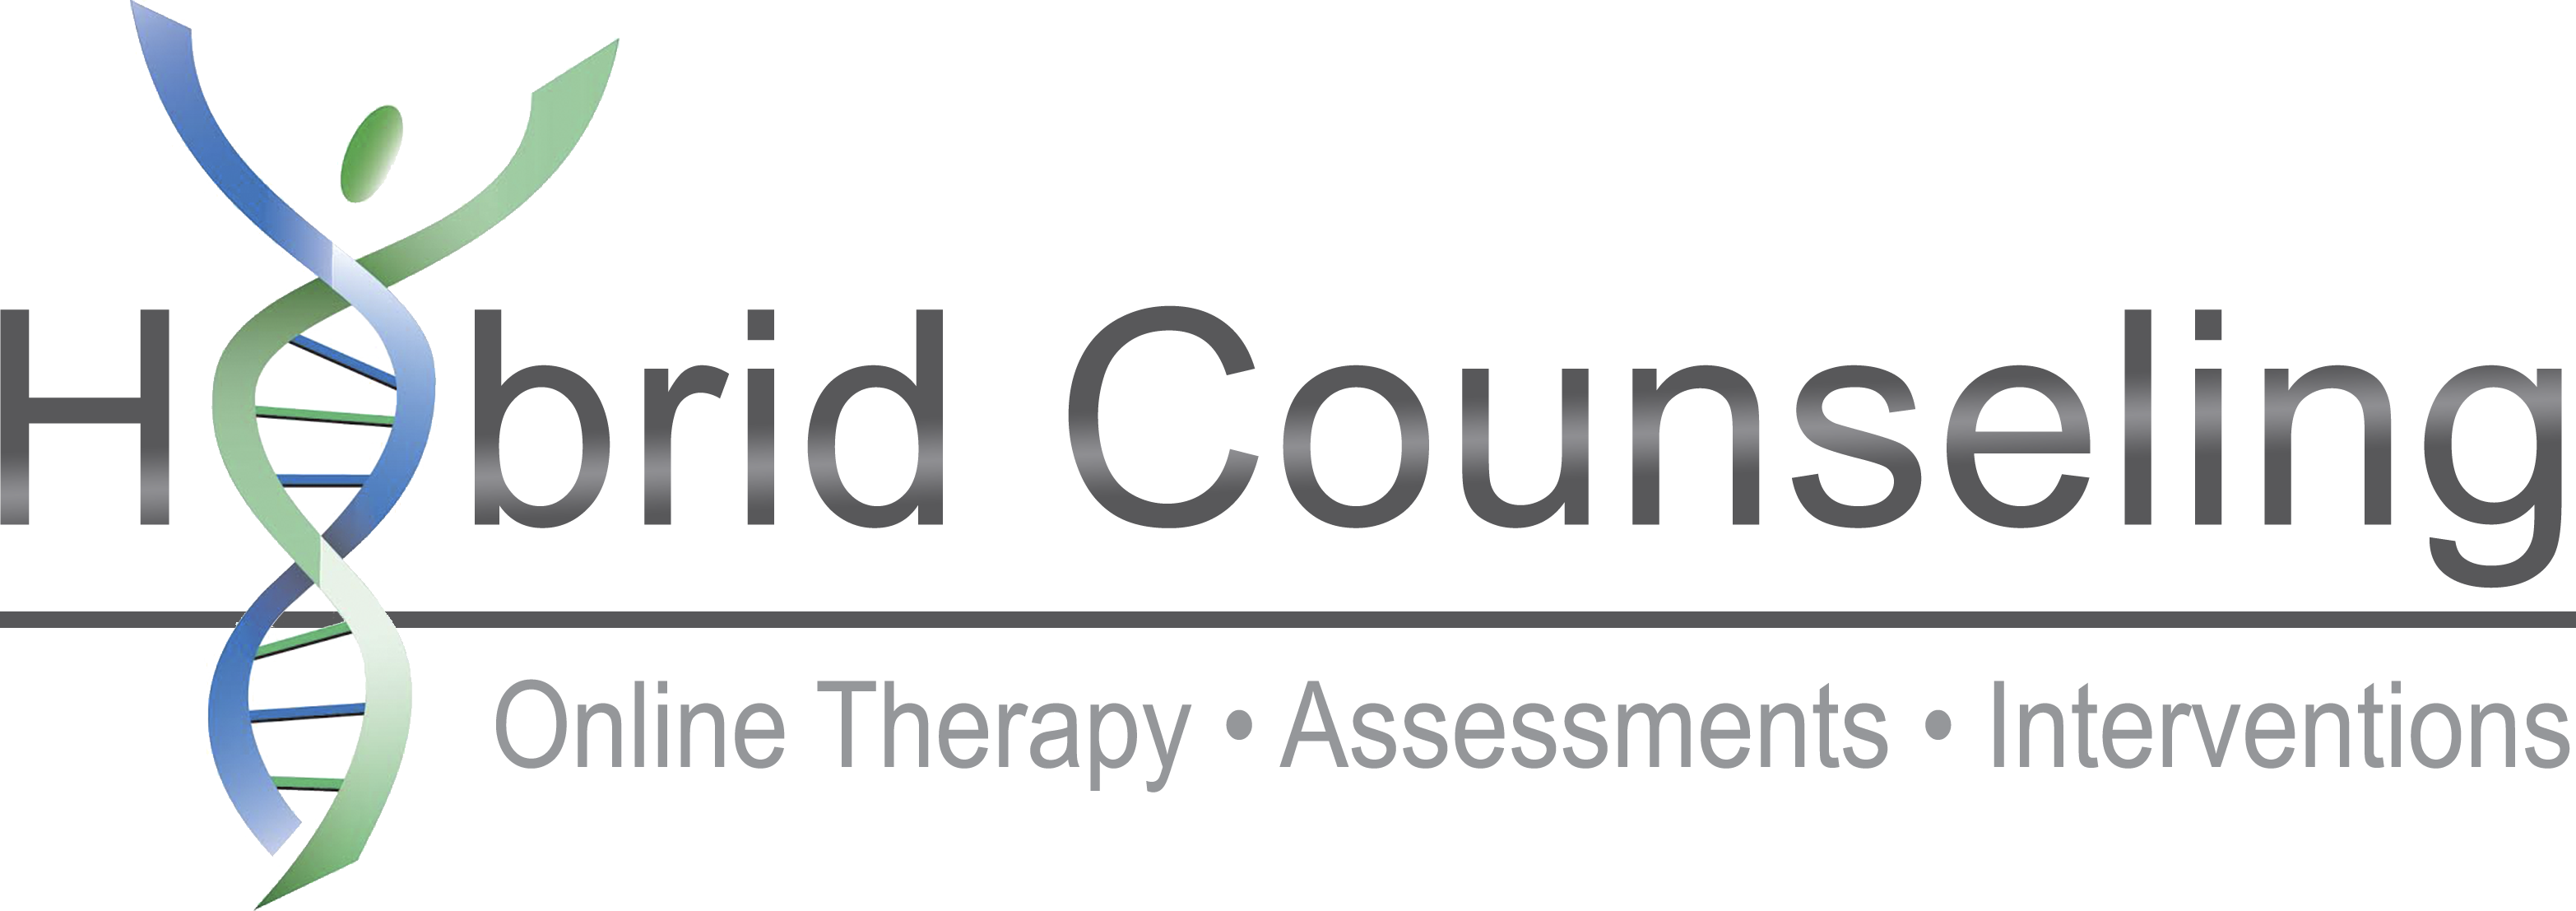 Hybrid Counseling